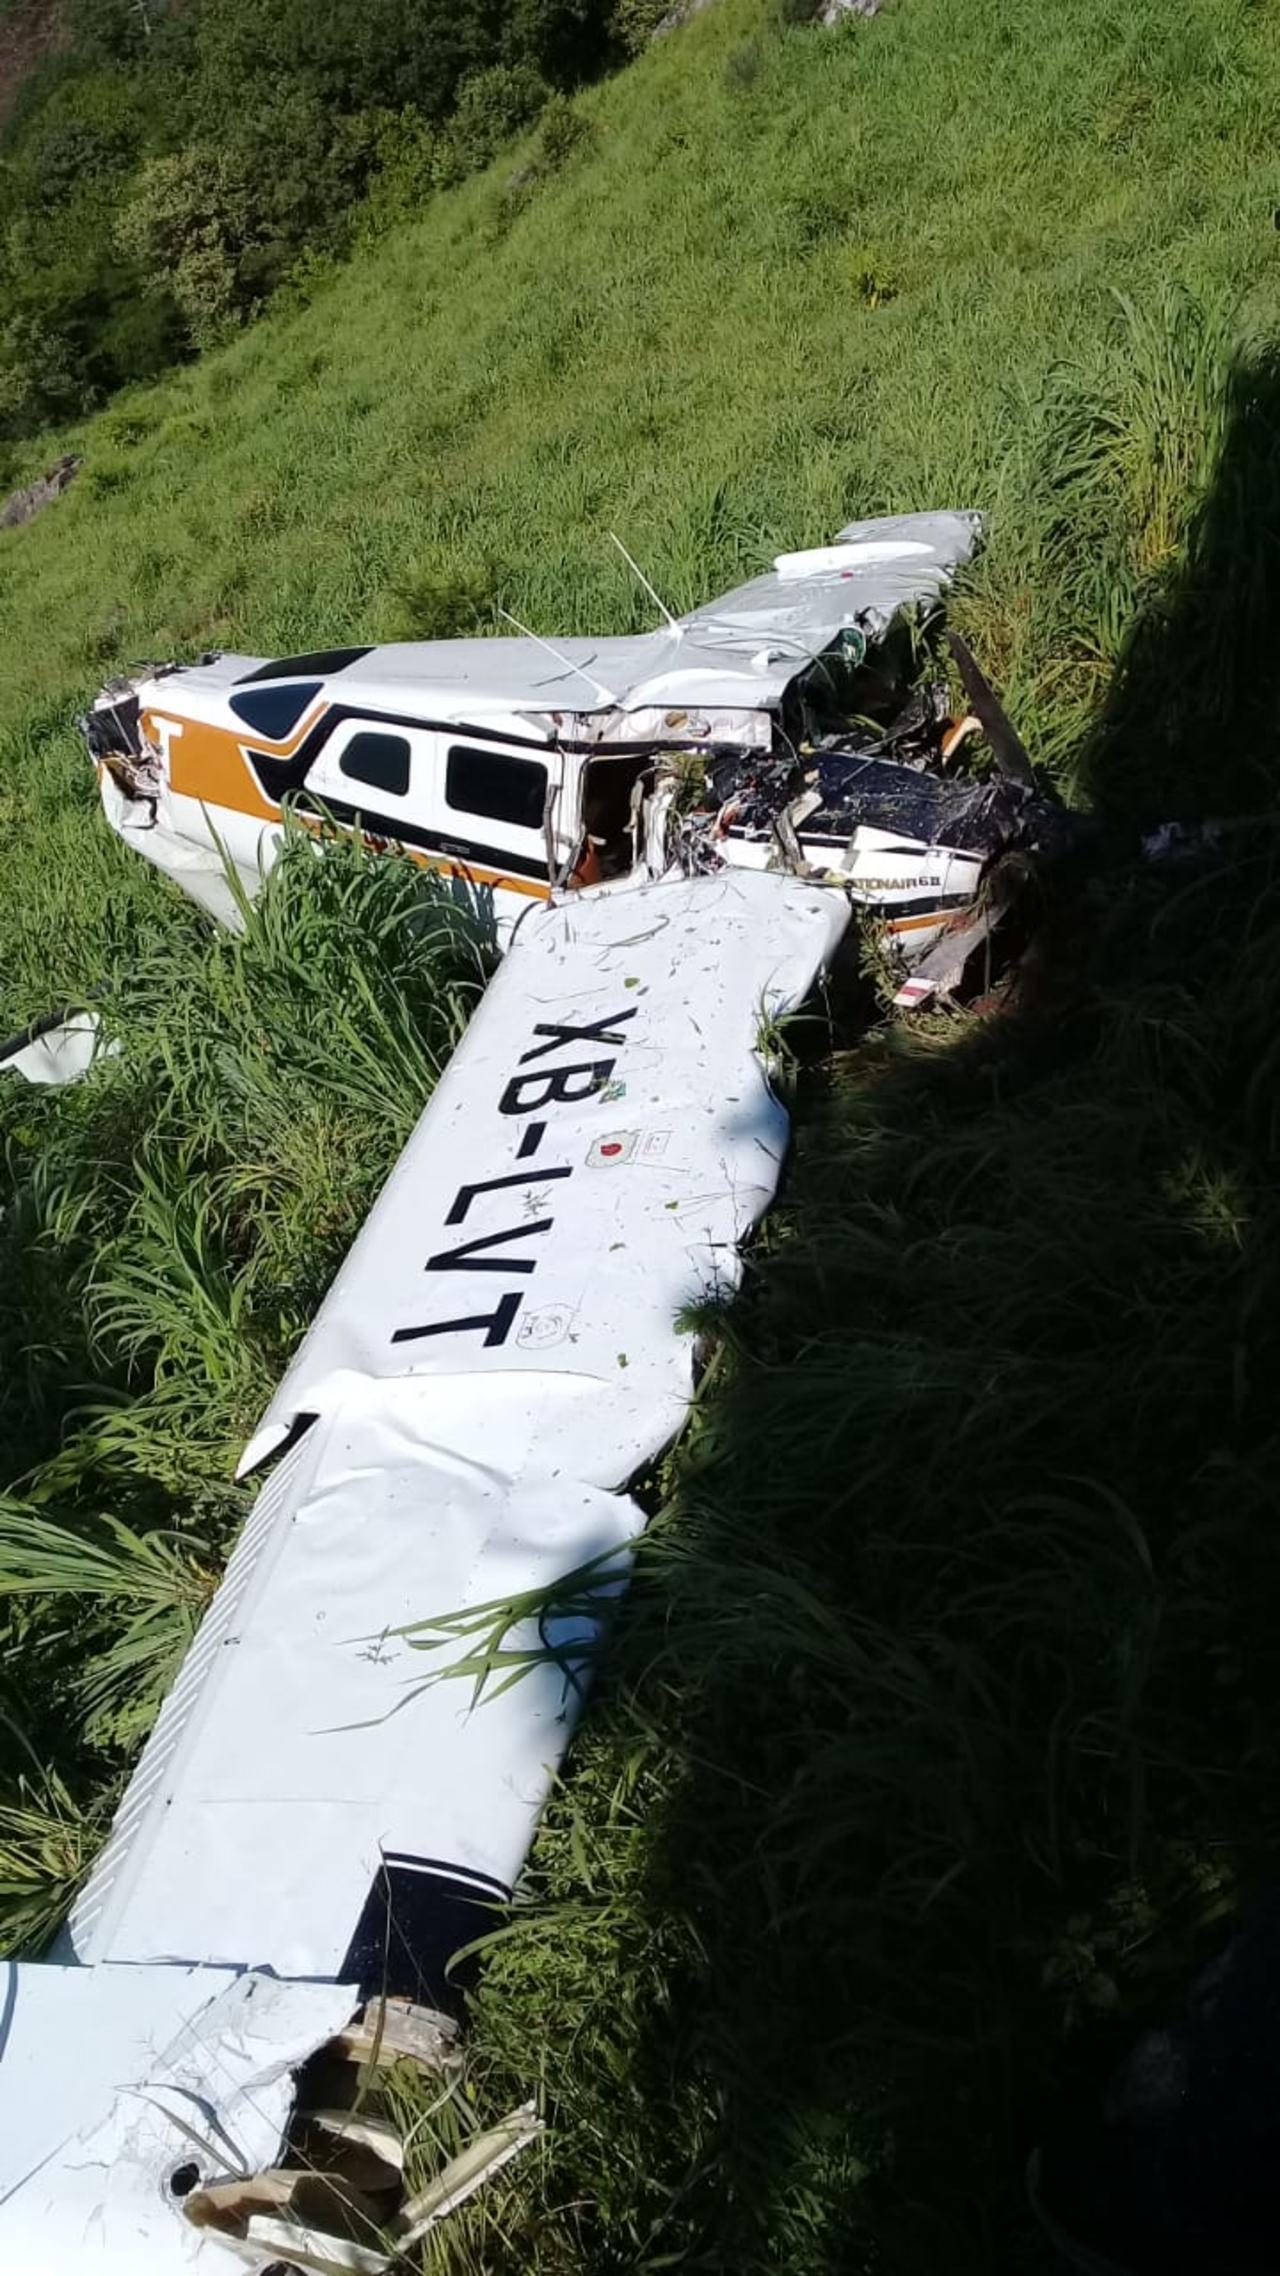 Buscan a dos víctimas de avionetazo en Topia